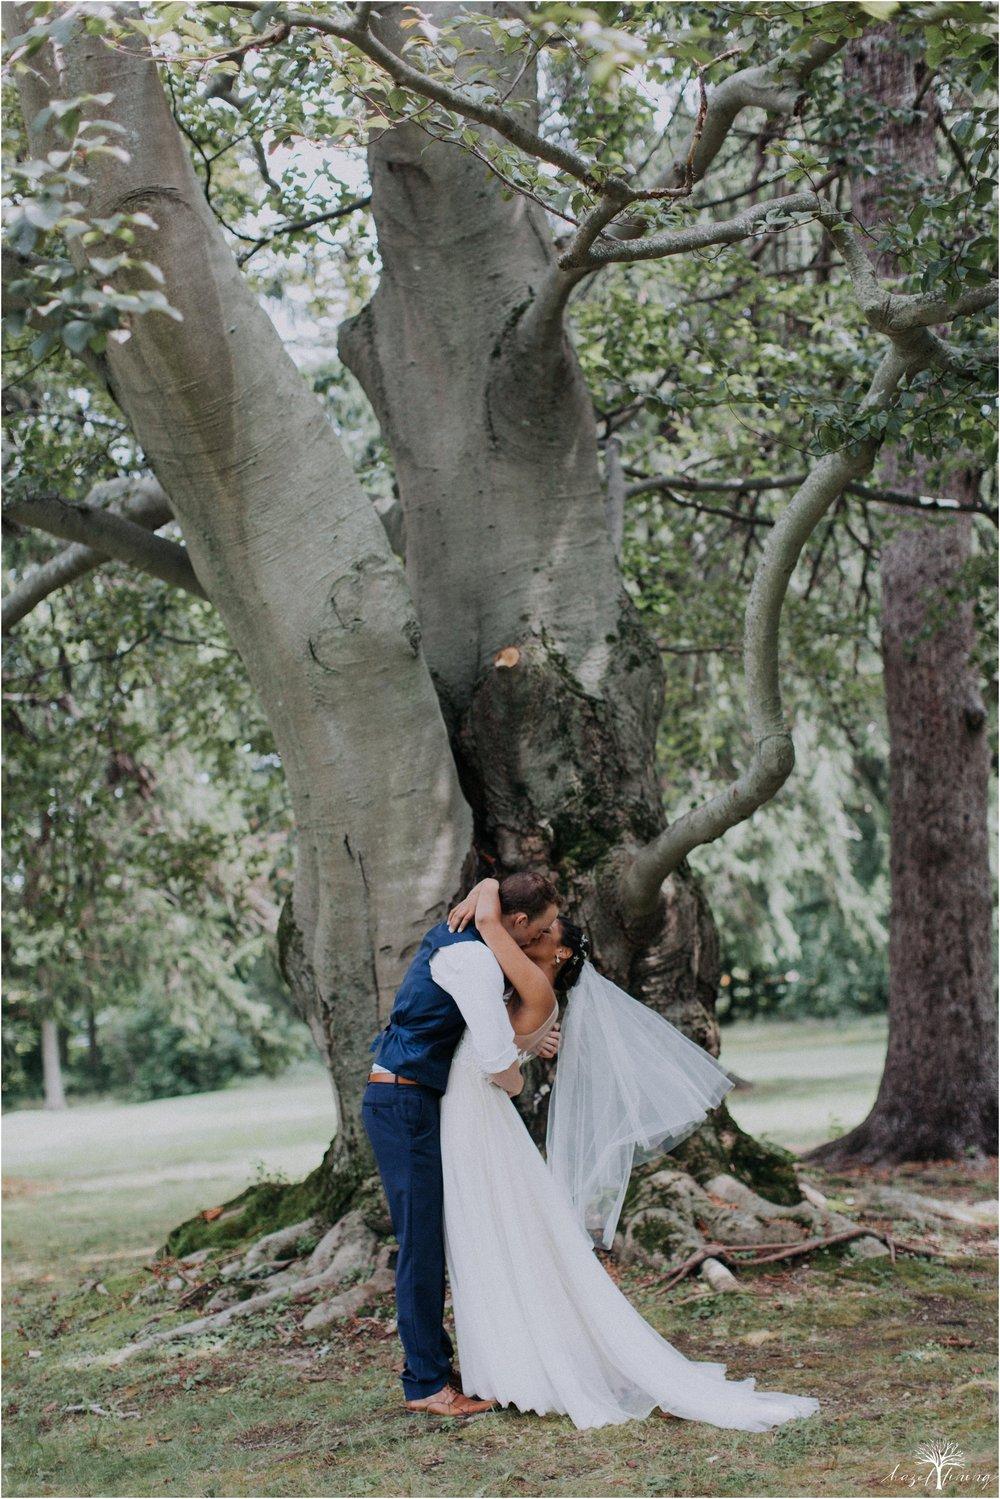 mariah-kreyling-samuel-sherratt-sherrattwiththeworld-peirce-farm-at-witch-hill-boston-massachusetts-wedding-photography-hazel-lining-travel-wedding-elopement-photography_0119.jpg